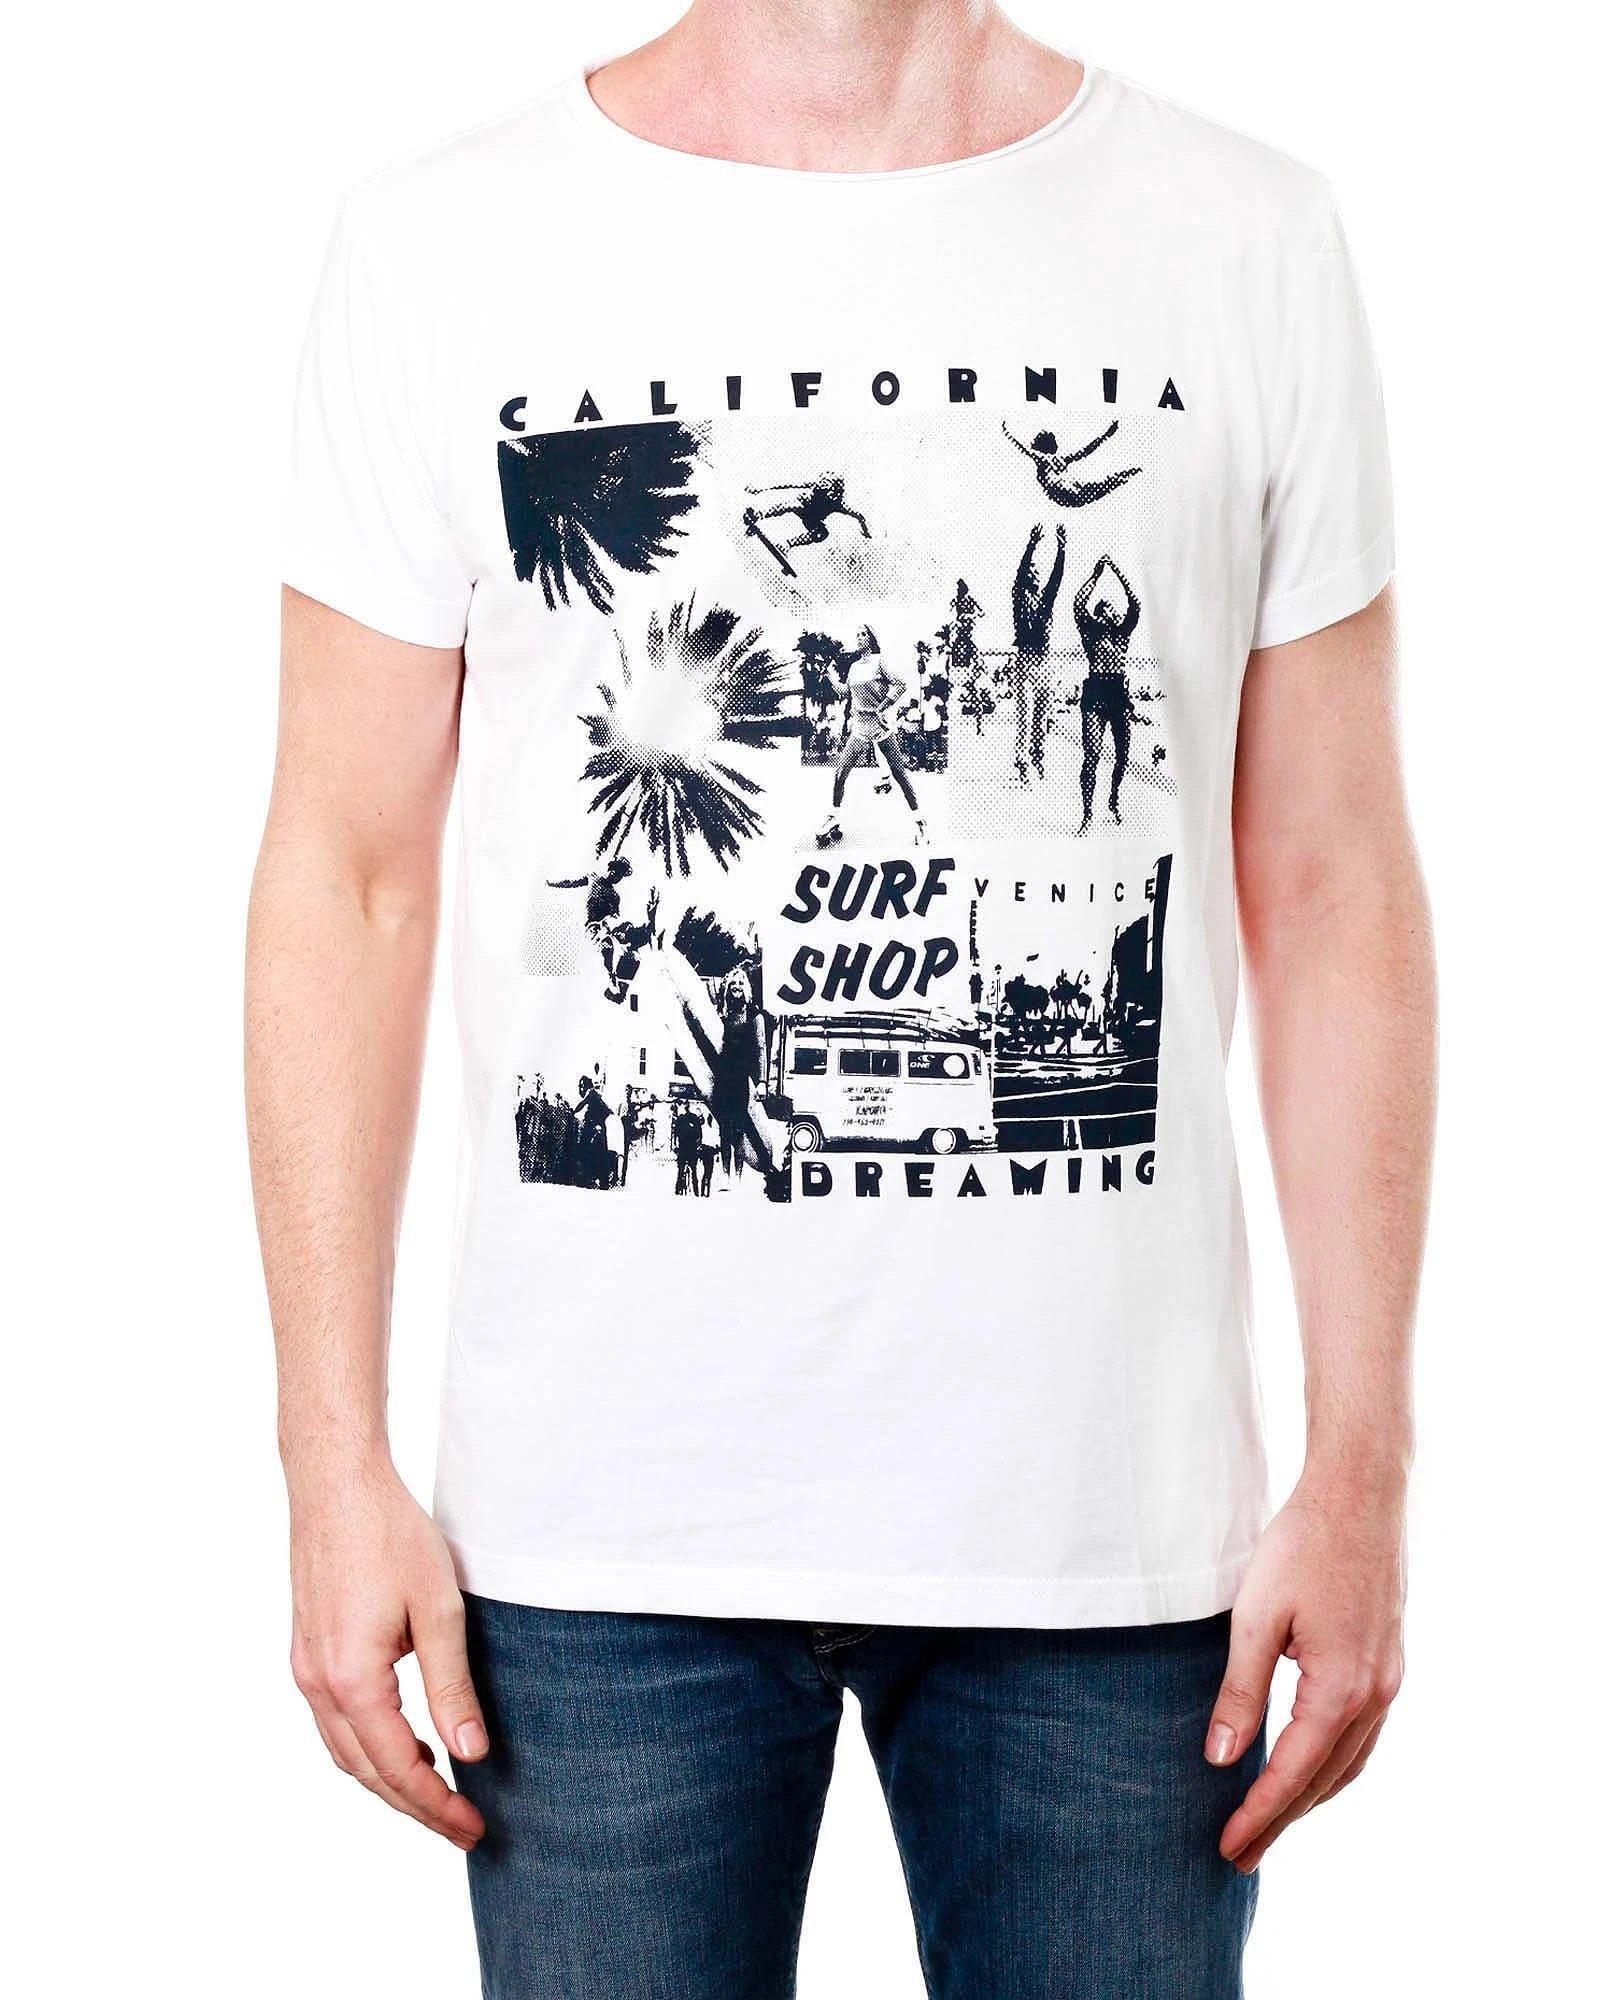 EBCC_Cali_Dreaming_Men_s_White_T-Shirt_Round_Collar_Dark_Blue_1B_1024x1024@2x